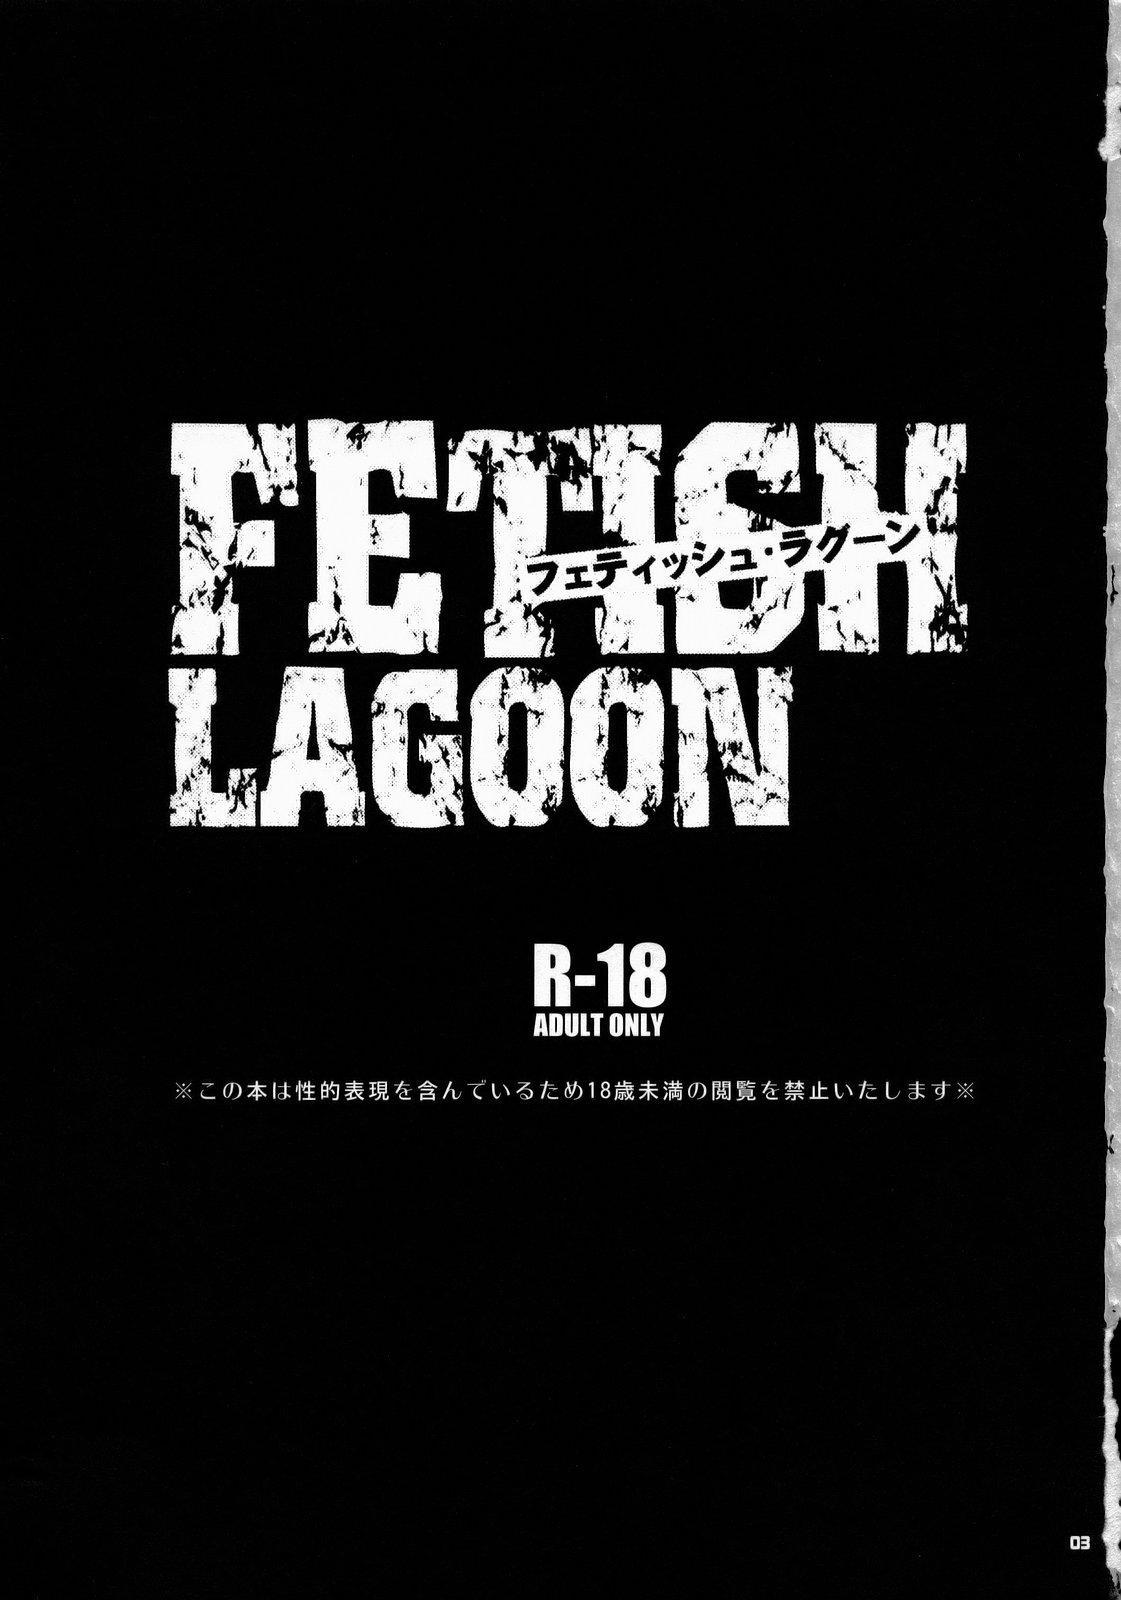 FETISH LAGOON 1